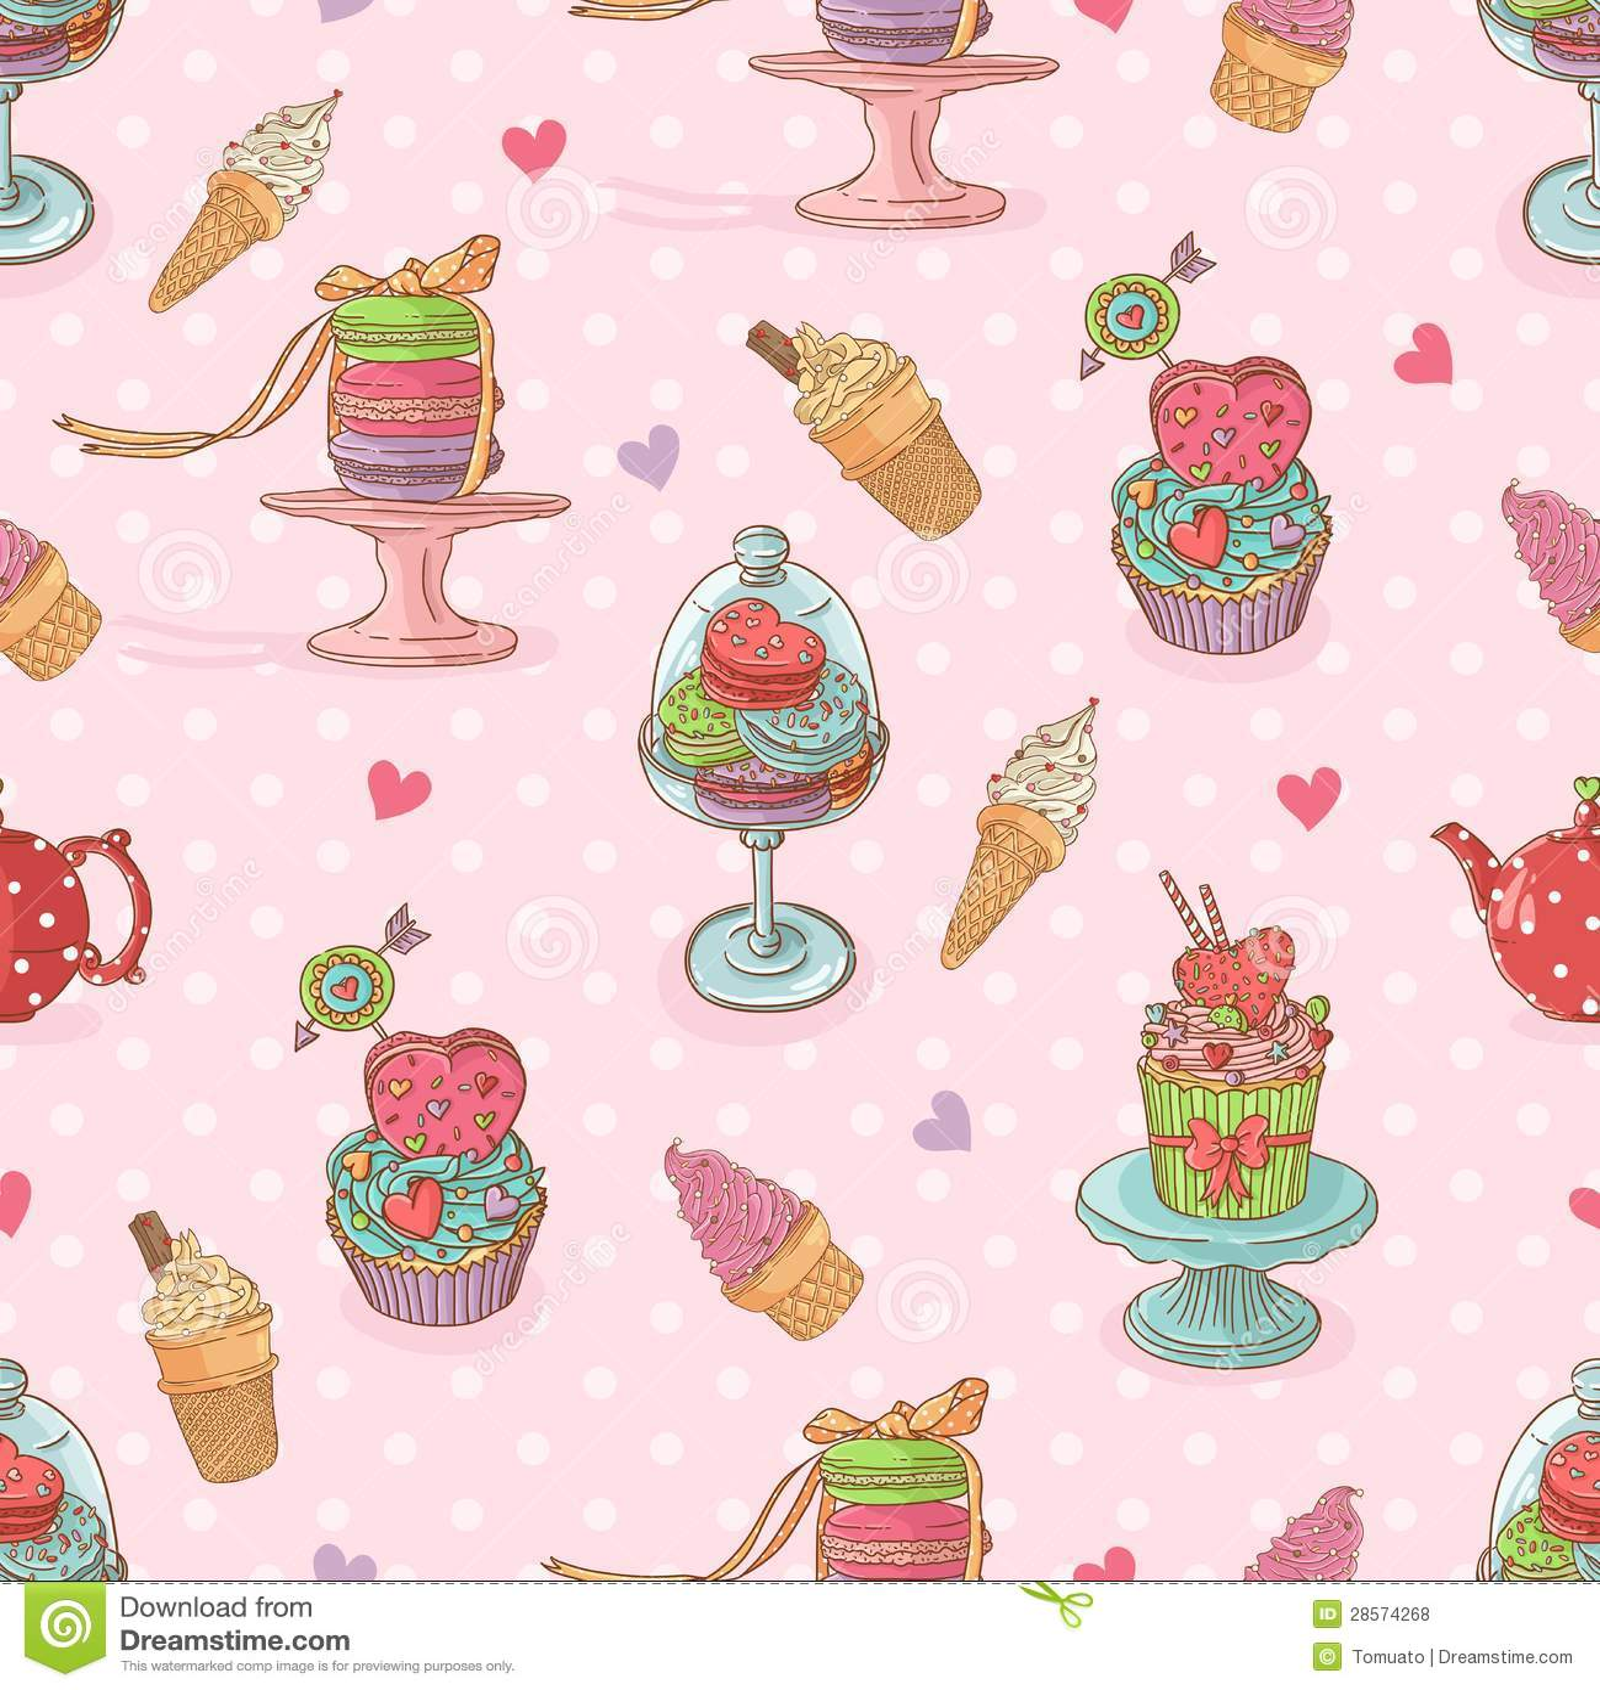 Download 8500 Wallpaper Es Krim Lucu Paling Keren